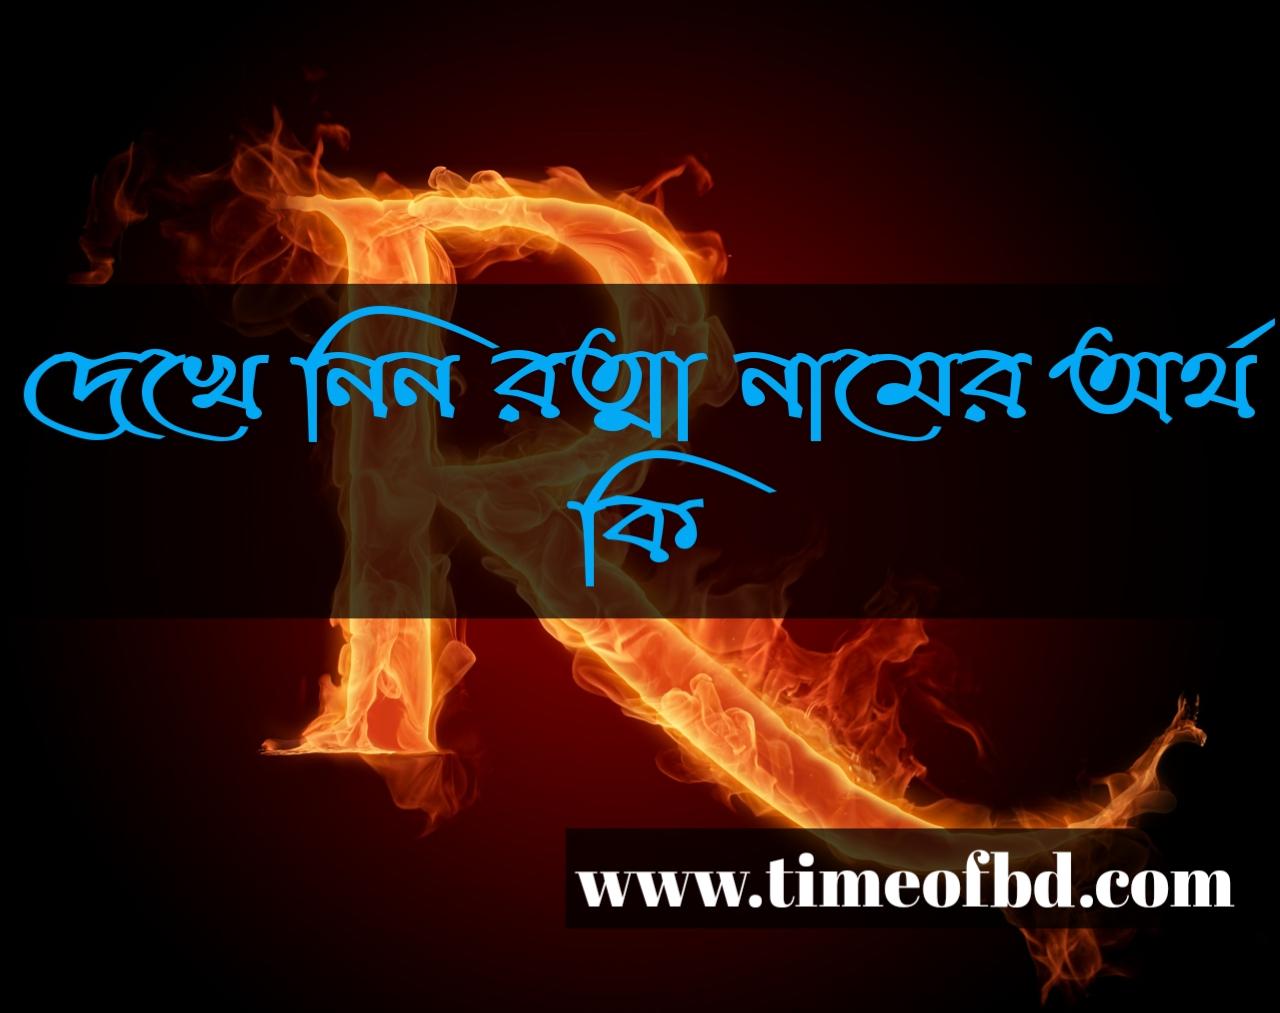 Ratna name meaning in Bengali, রত্মা নামের অর্থ কি, রত্মা নামের বাংলা অর্থ কি, রত্মা নামের ইসলামিক অর্থ কি,